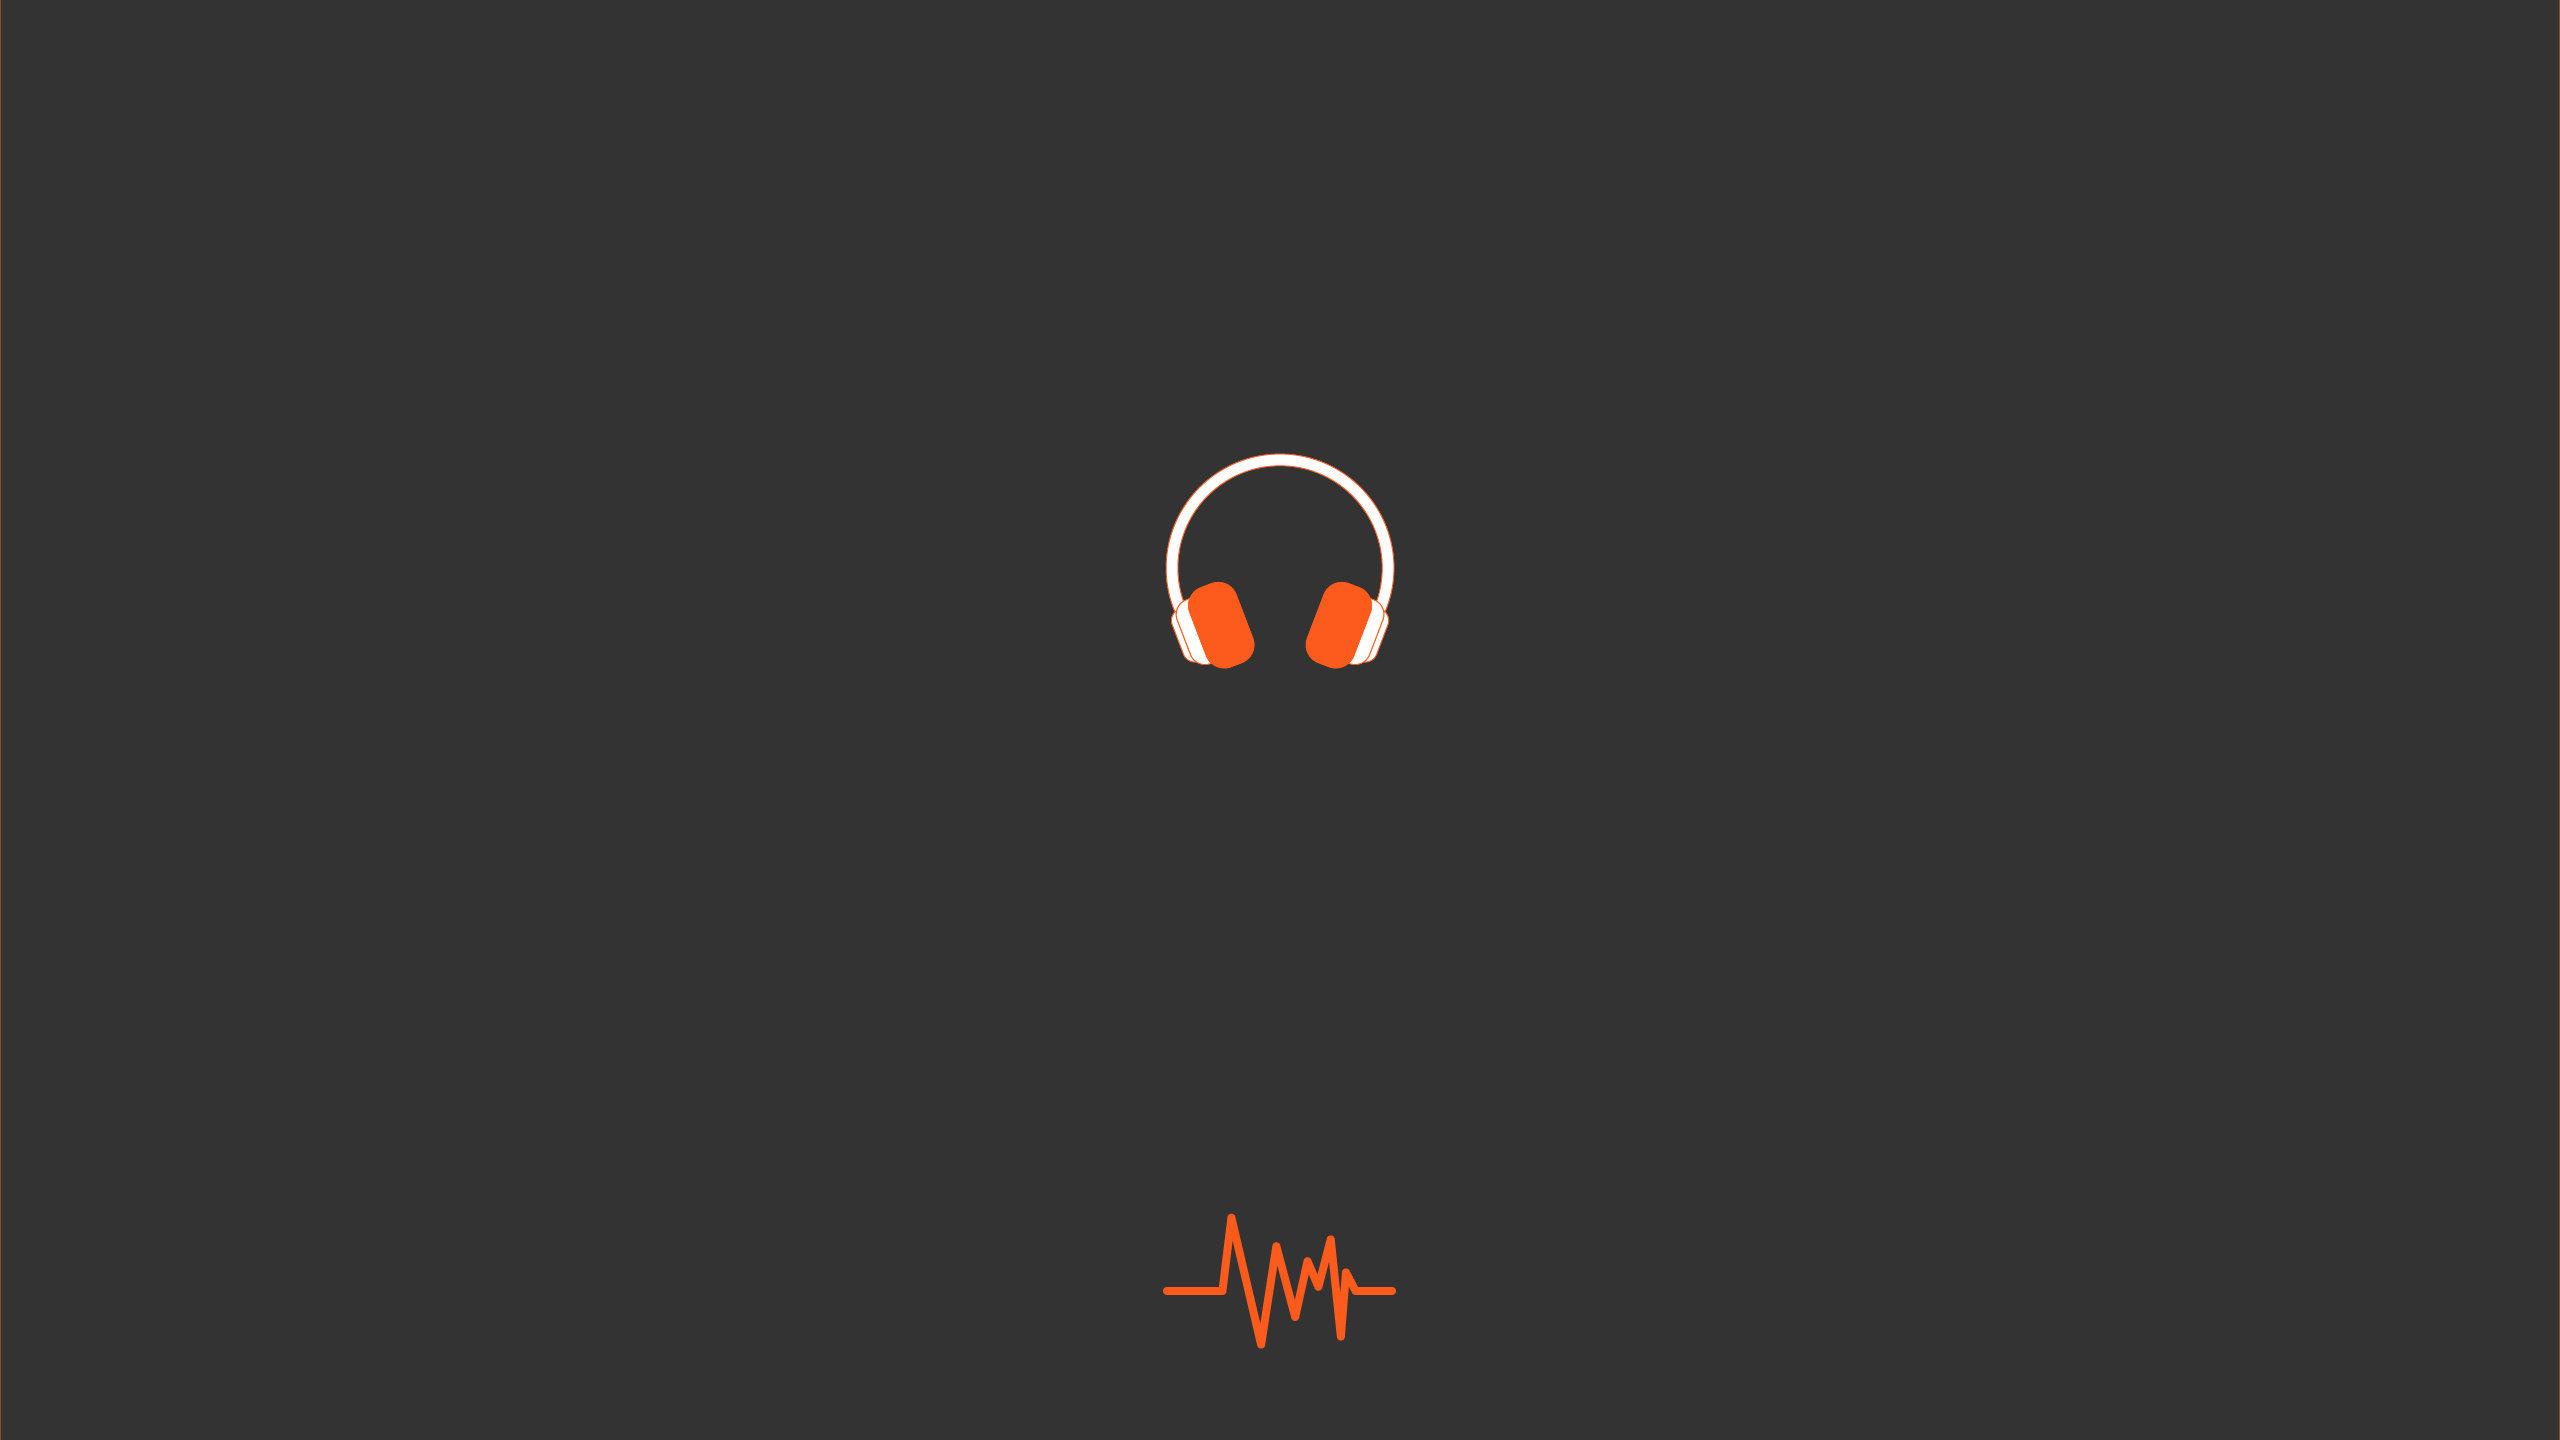 Hardwell I Am Hardwell Music Dj Poster Wallpapers Hd: Minimal Headphones Wallpaper